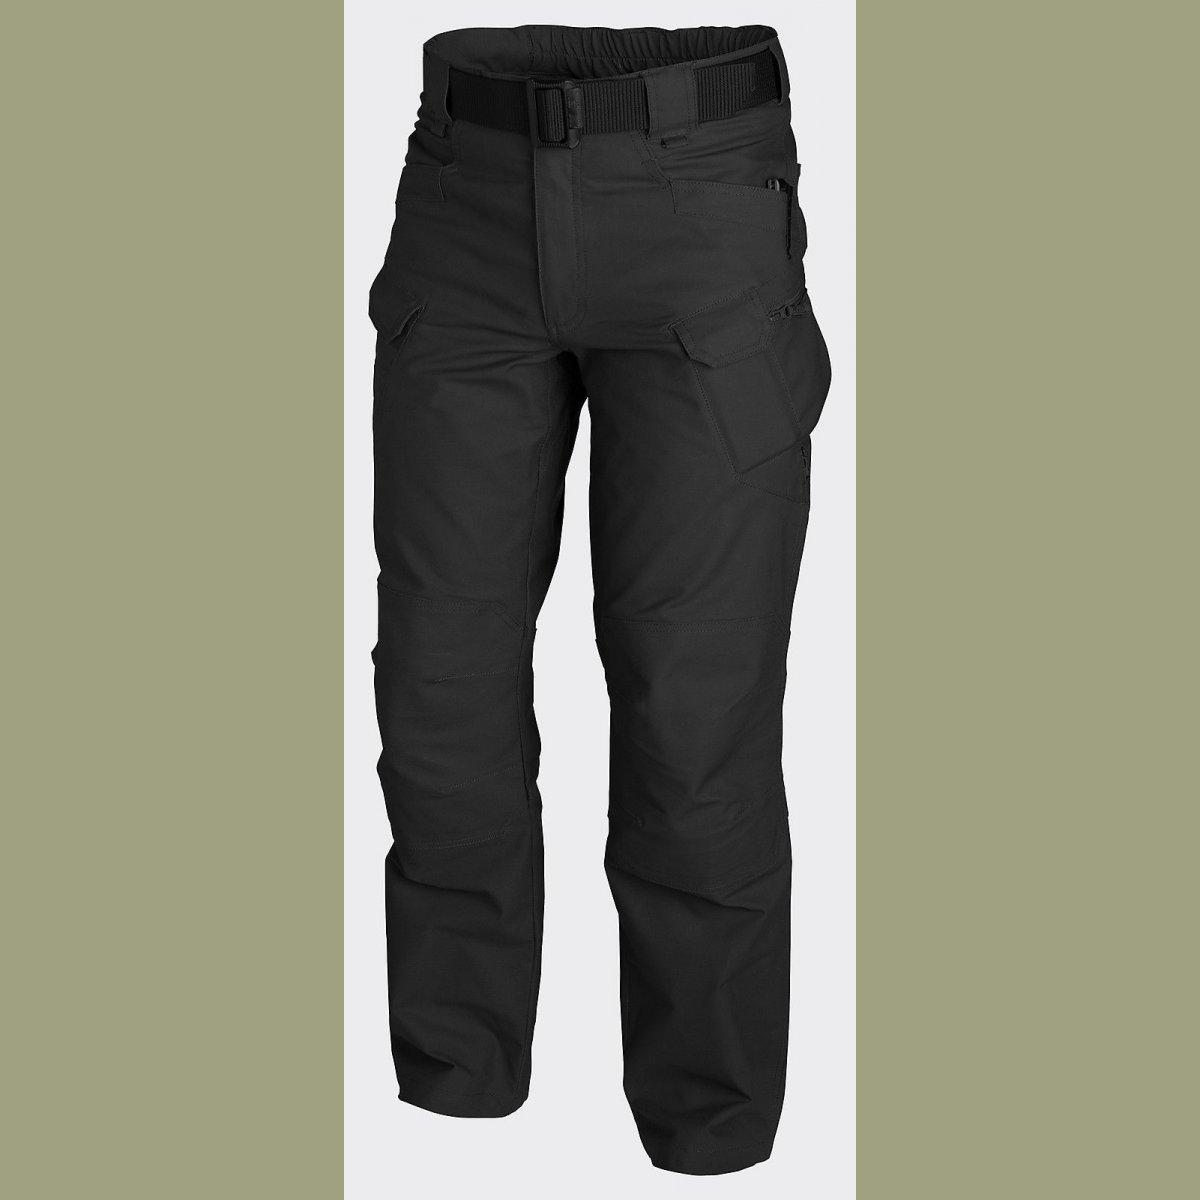 Funsport US ACU AT Digital Feldhose Army UCP RipStop Tarnhose pants trousers Hose Medium